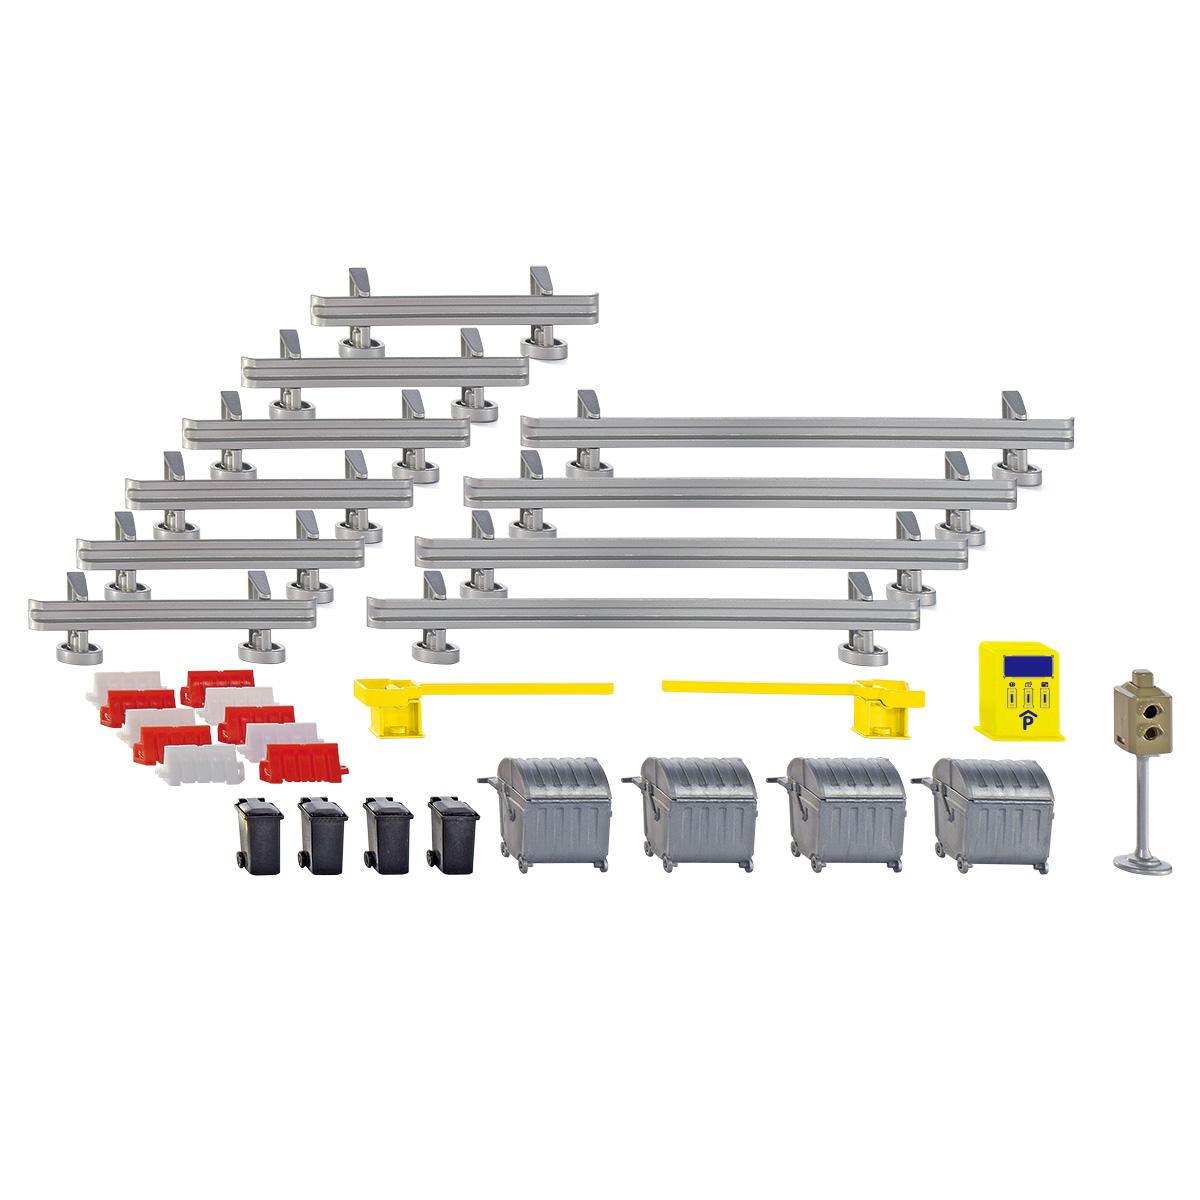 SIKU WORLD用アクセサリー 駐車場セット (ジク・SIKU)